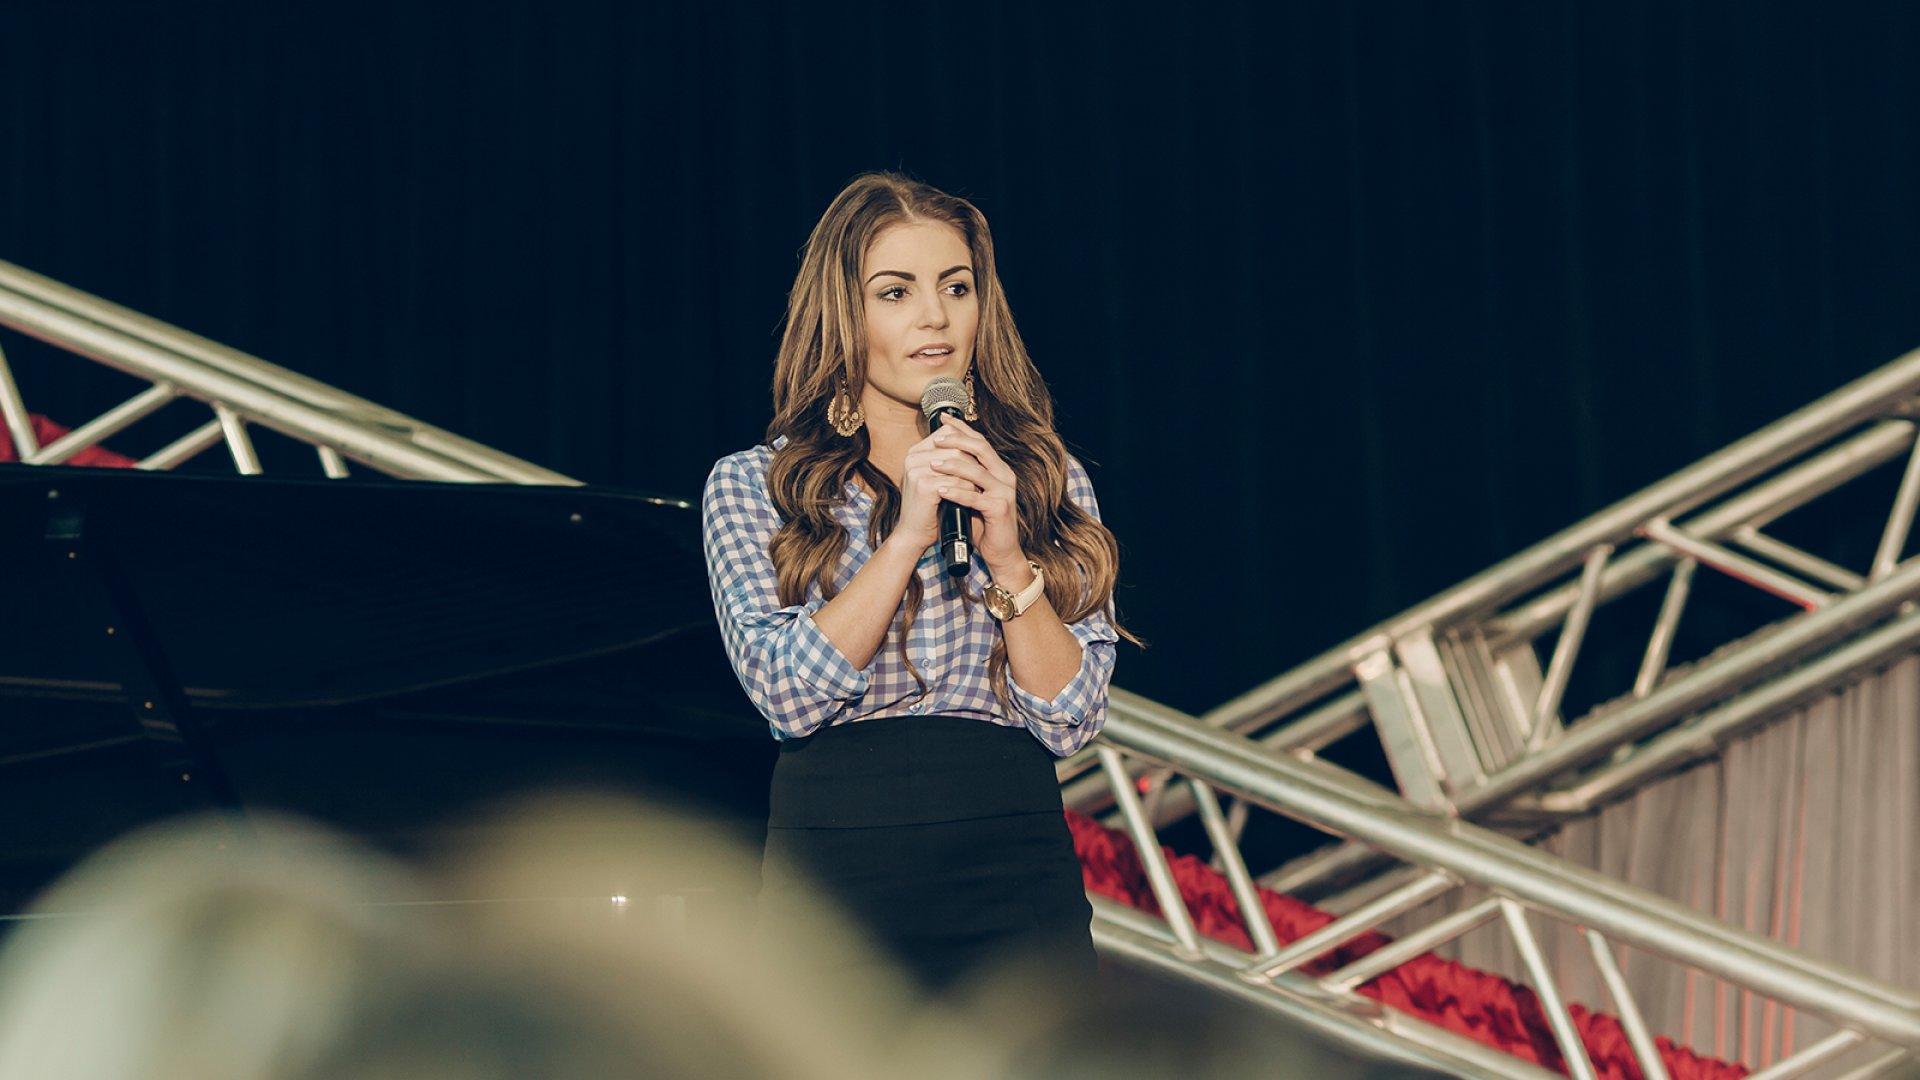 Student Maid CEO Kristen Hadeed speaking at TEDx St. Louis Women.